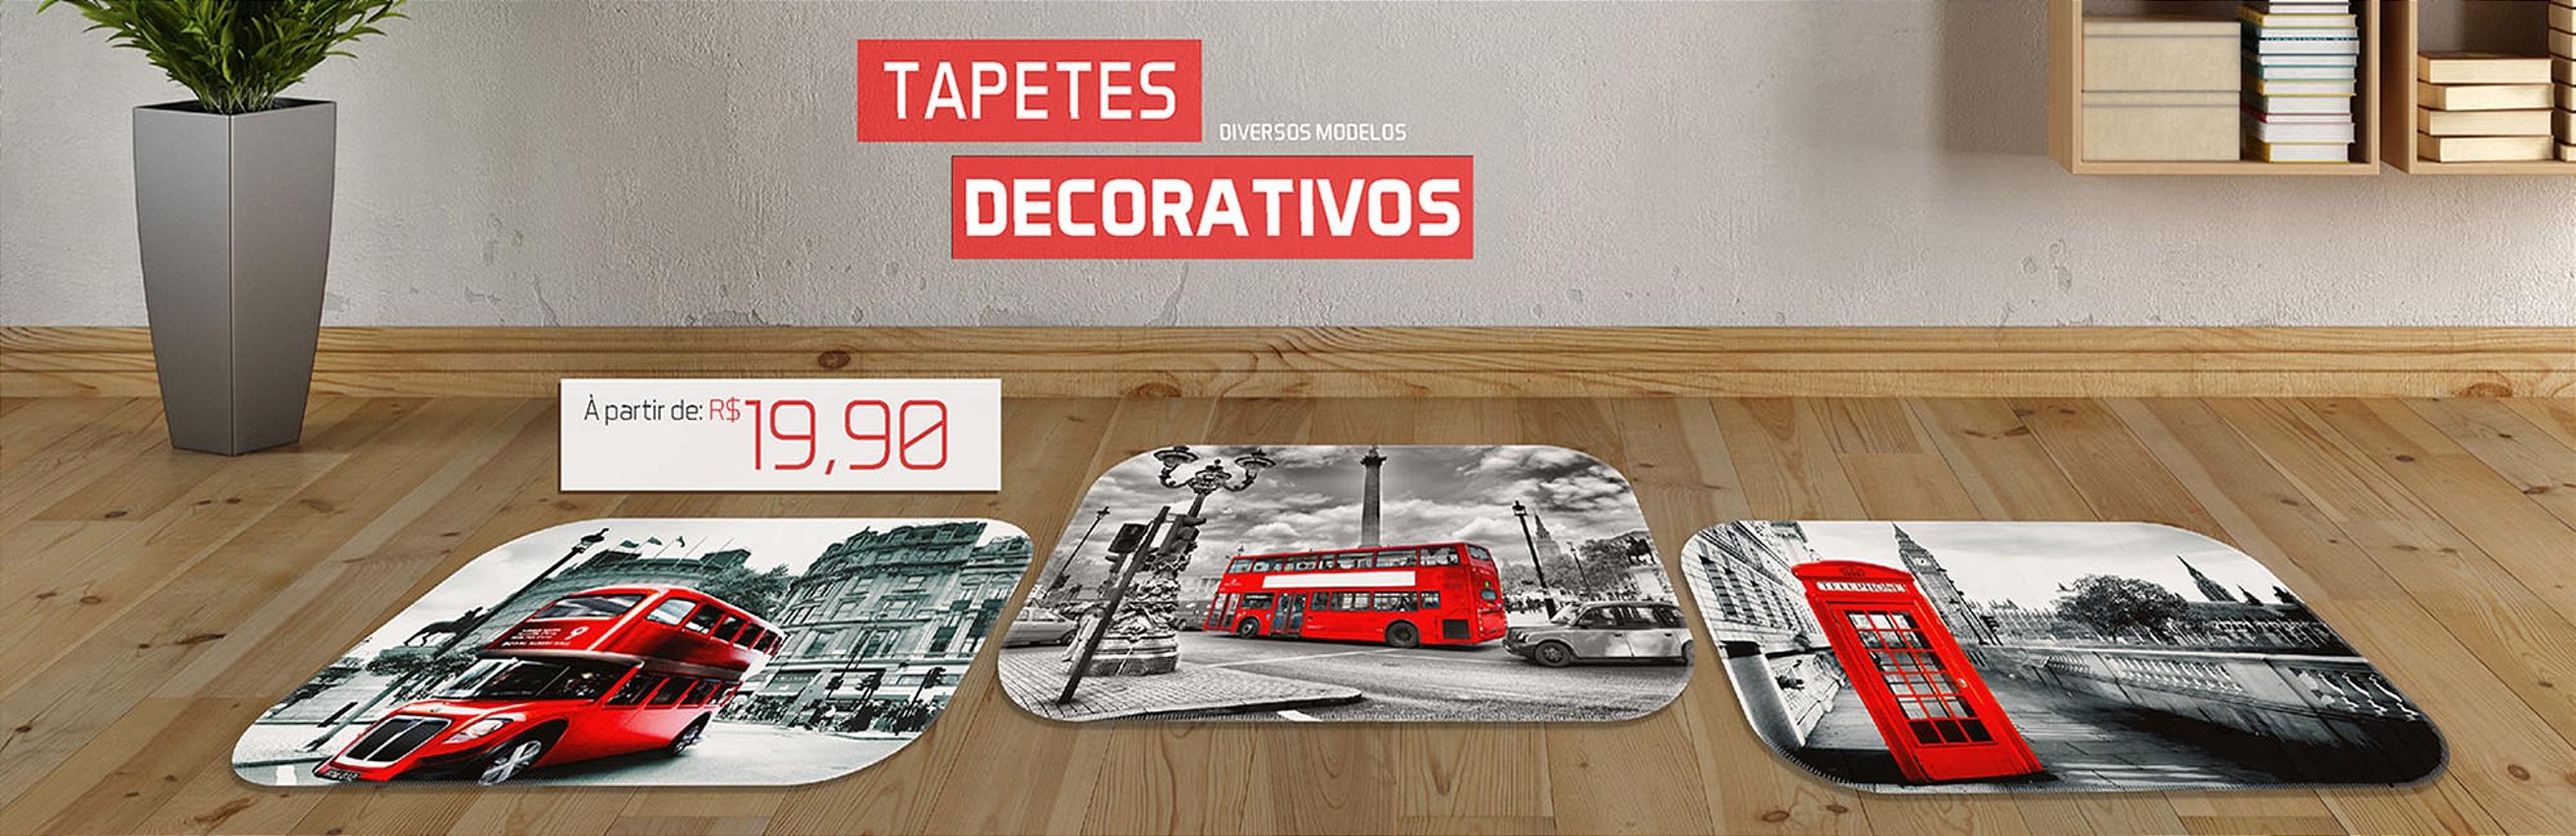 Banner Tapetes